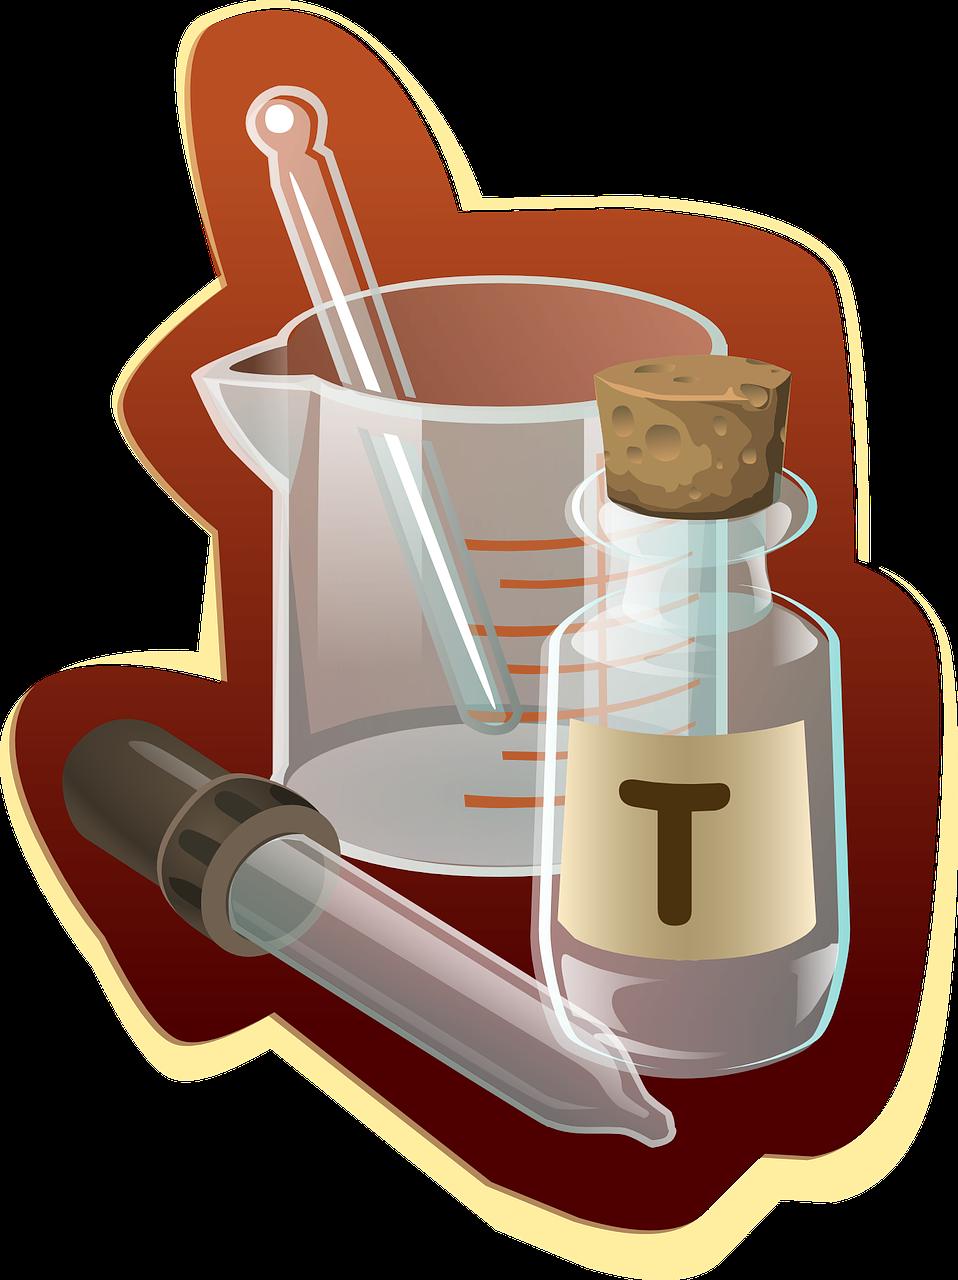 Drug clipart overdose. How does otc in